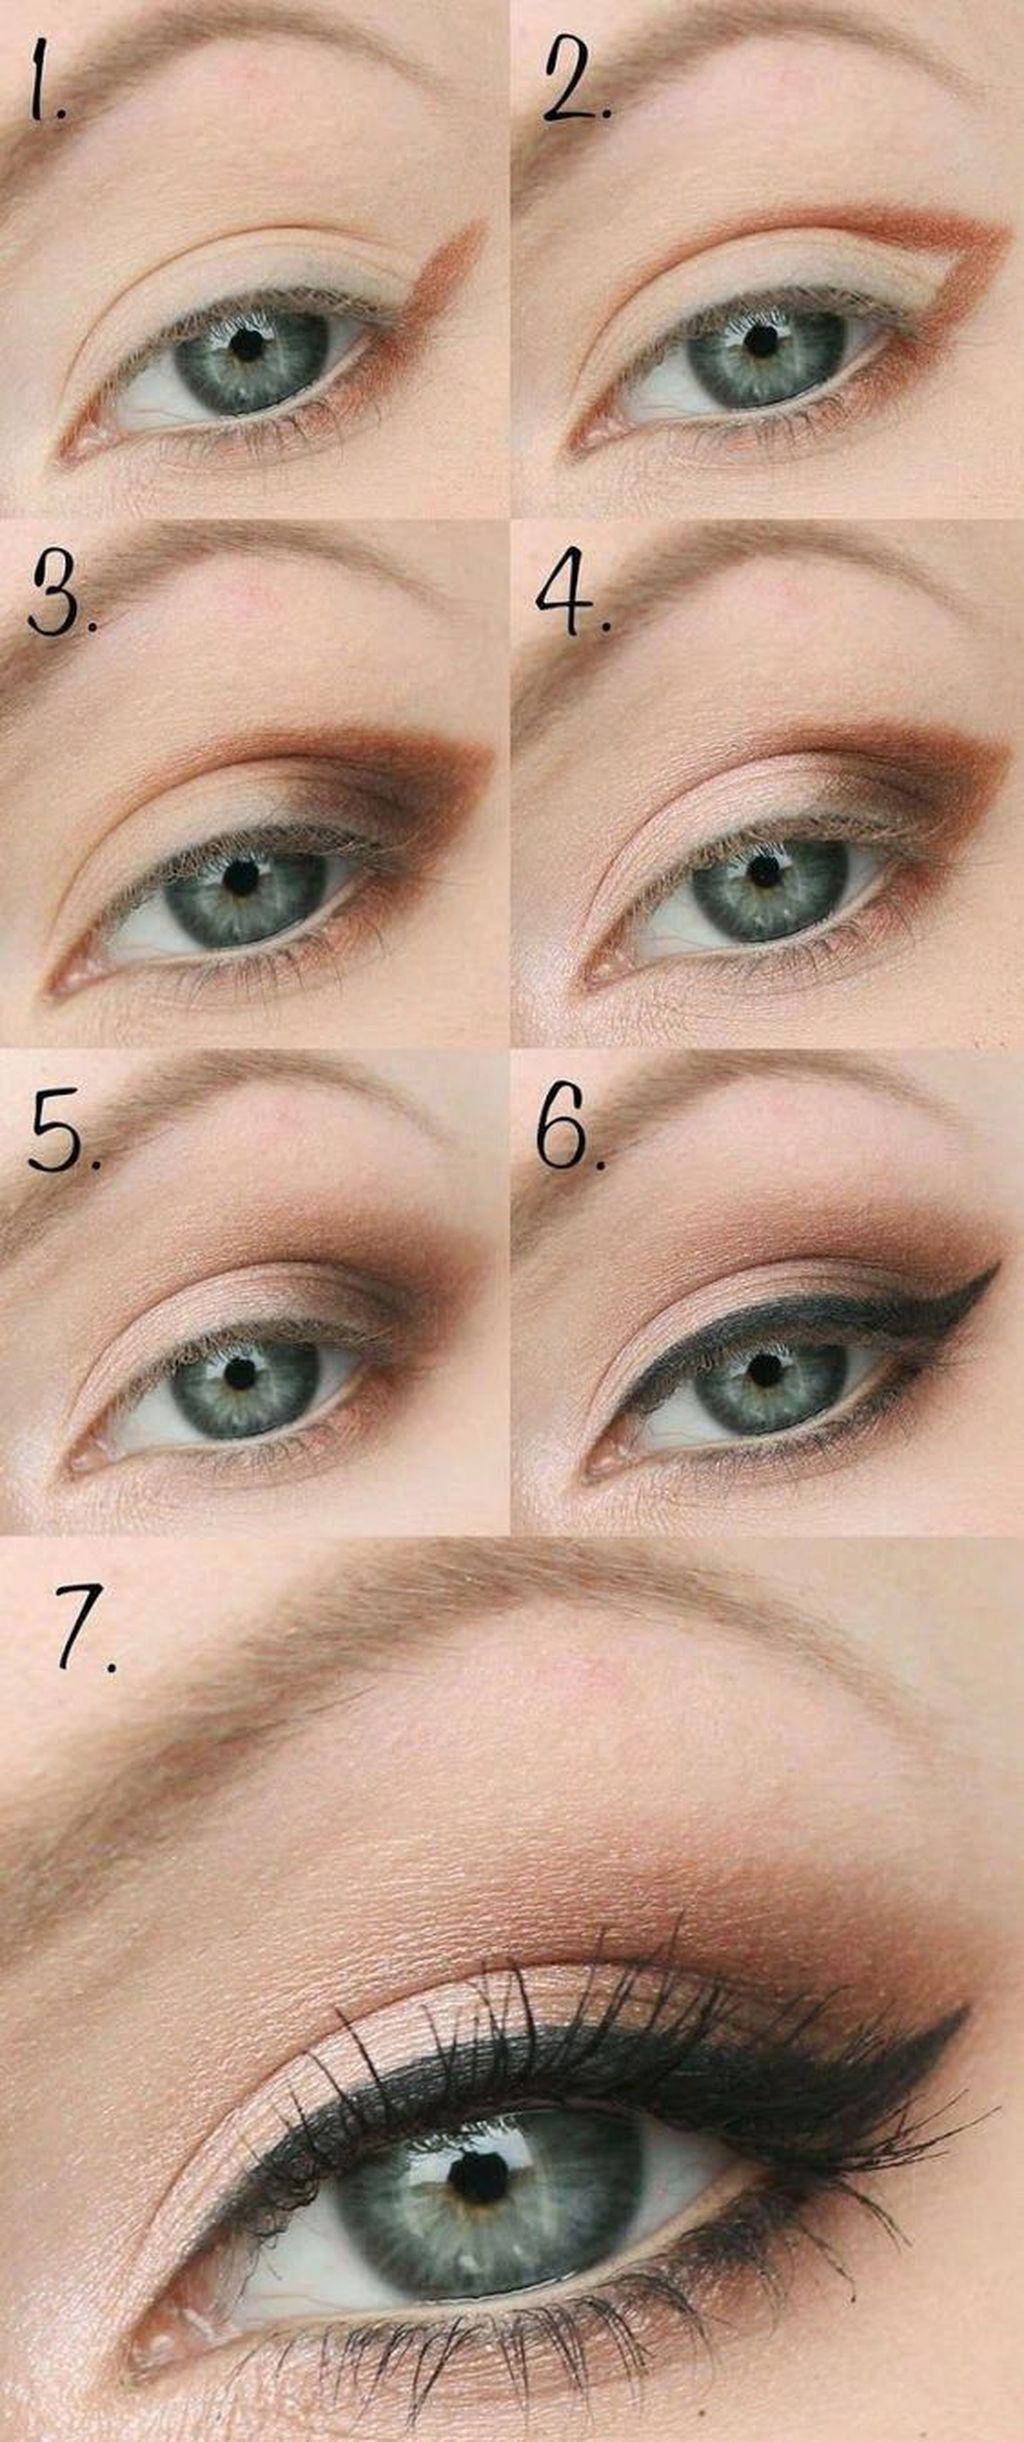 30+ Easy Eye Makeup Tutorials Ideas For Beginners To Try 30+ Easy Eye Makeup Tutorials Ideas For Beginners To Try Makeup Trends 2019 eye makeup tutorial